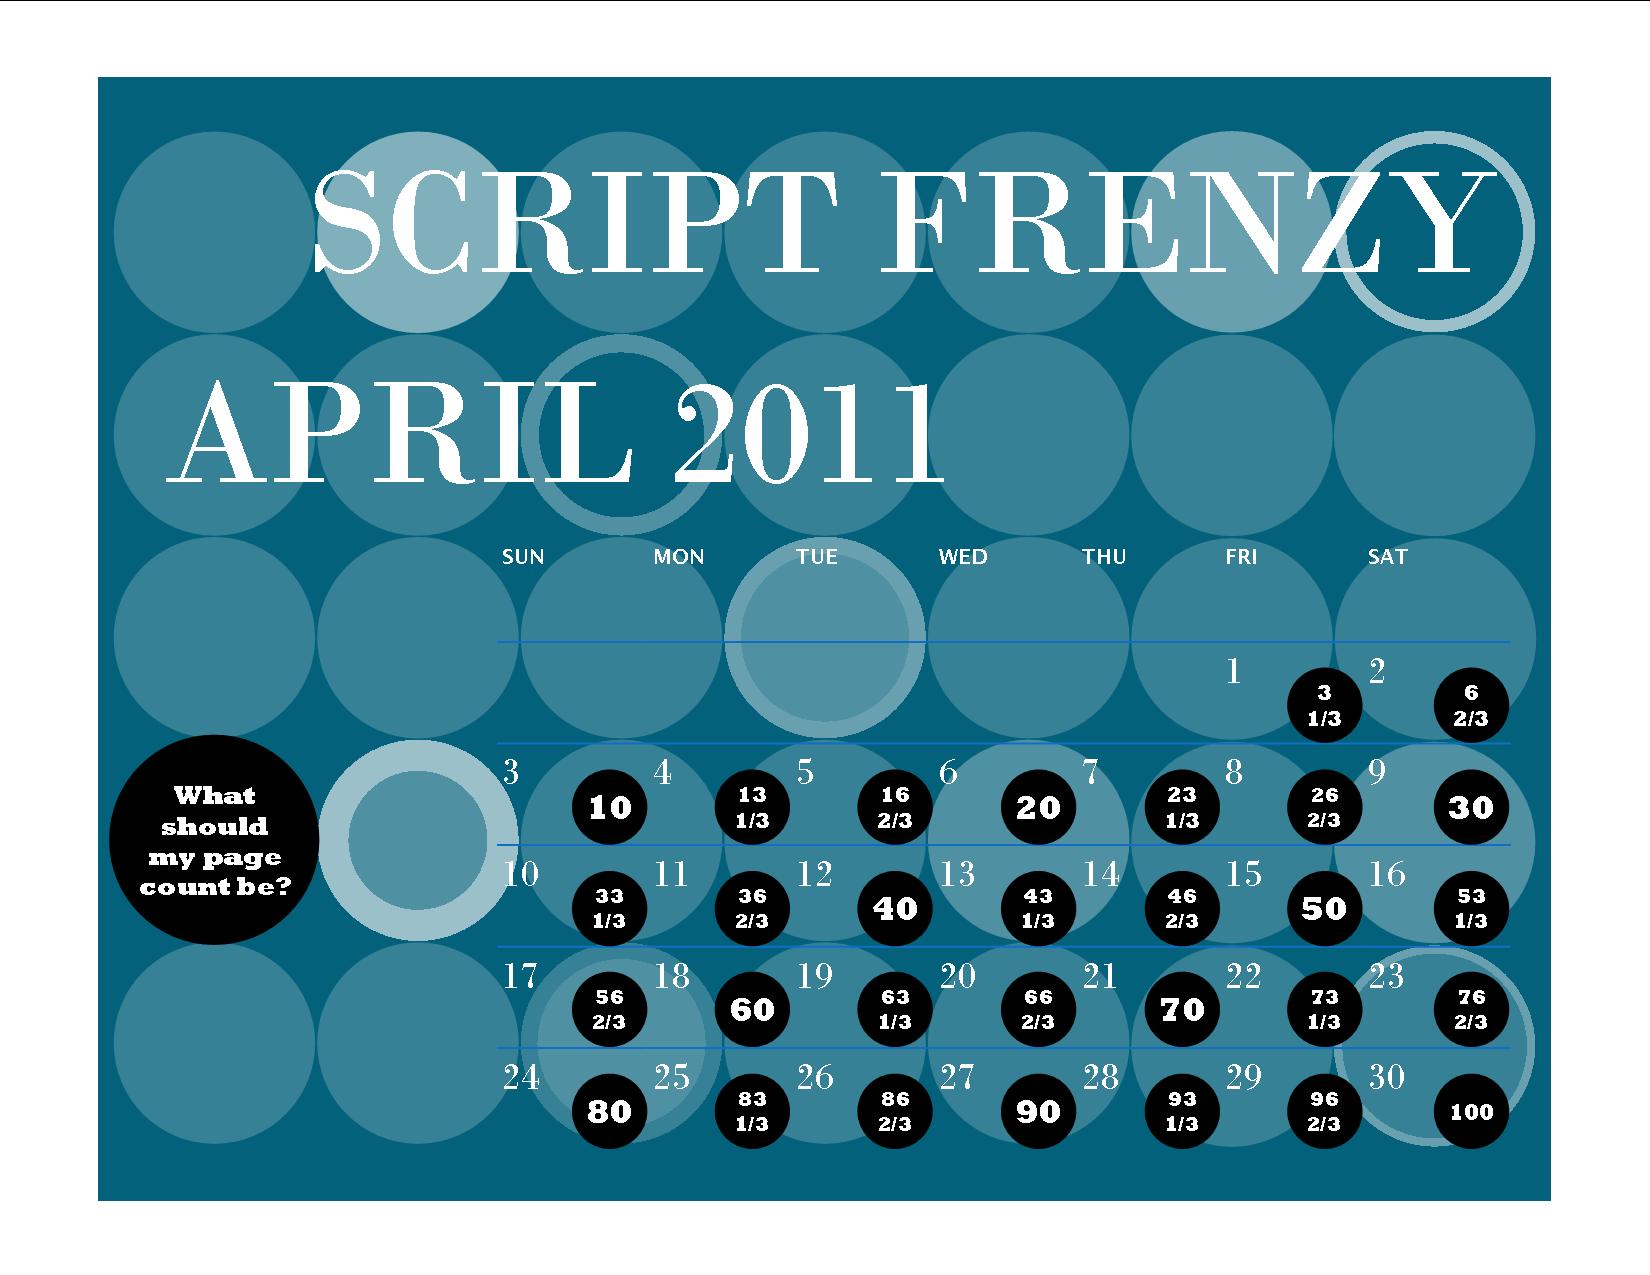 Script Frenzy Desktop Background Wallpaper Calendars (2011